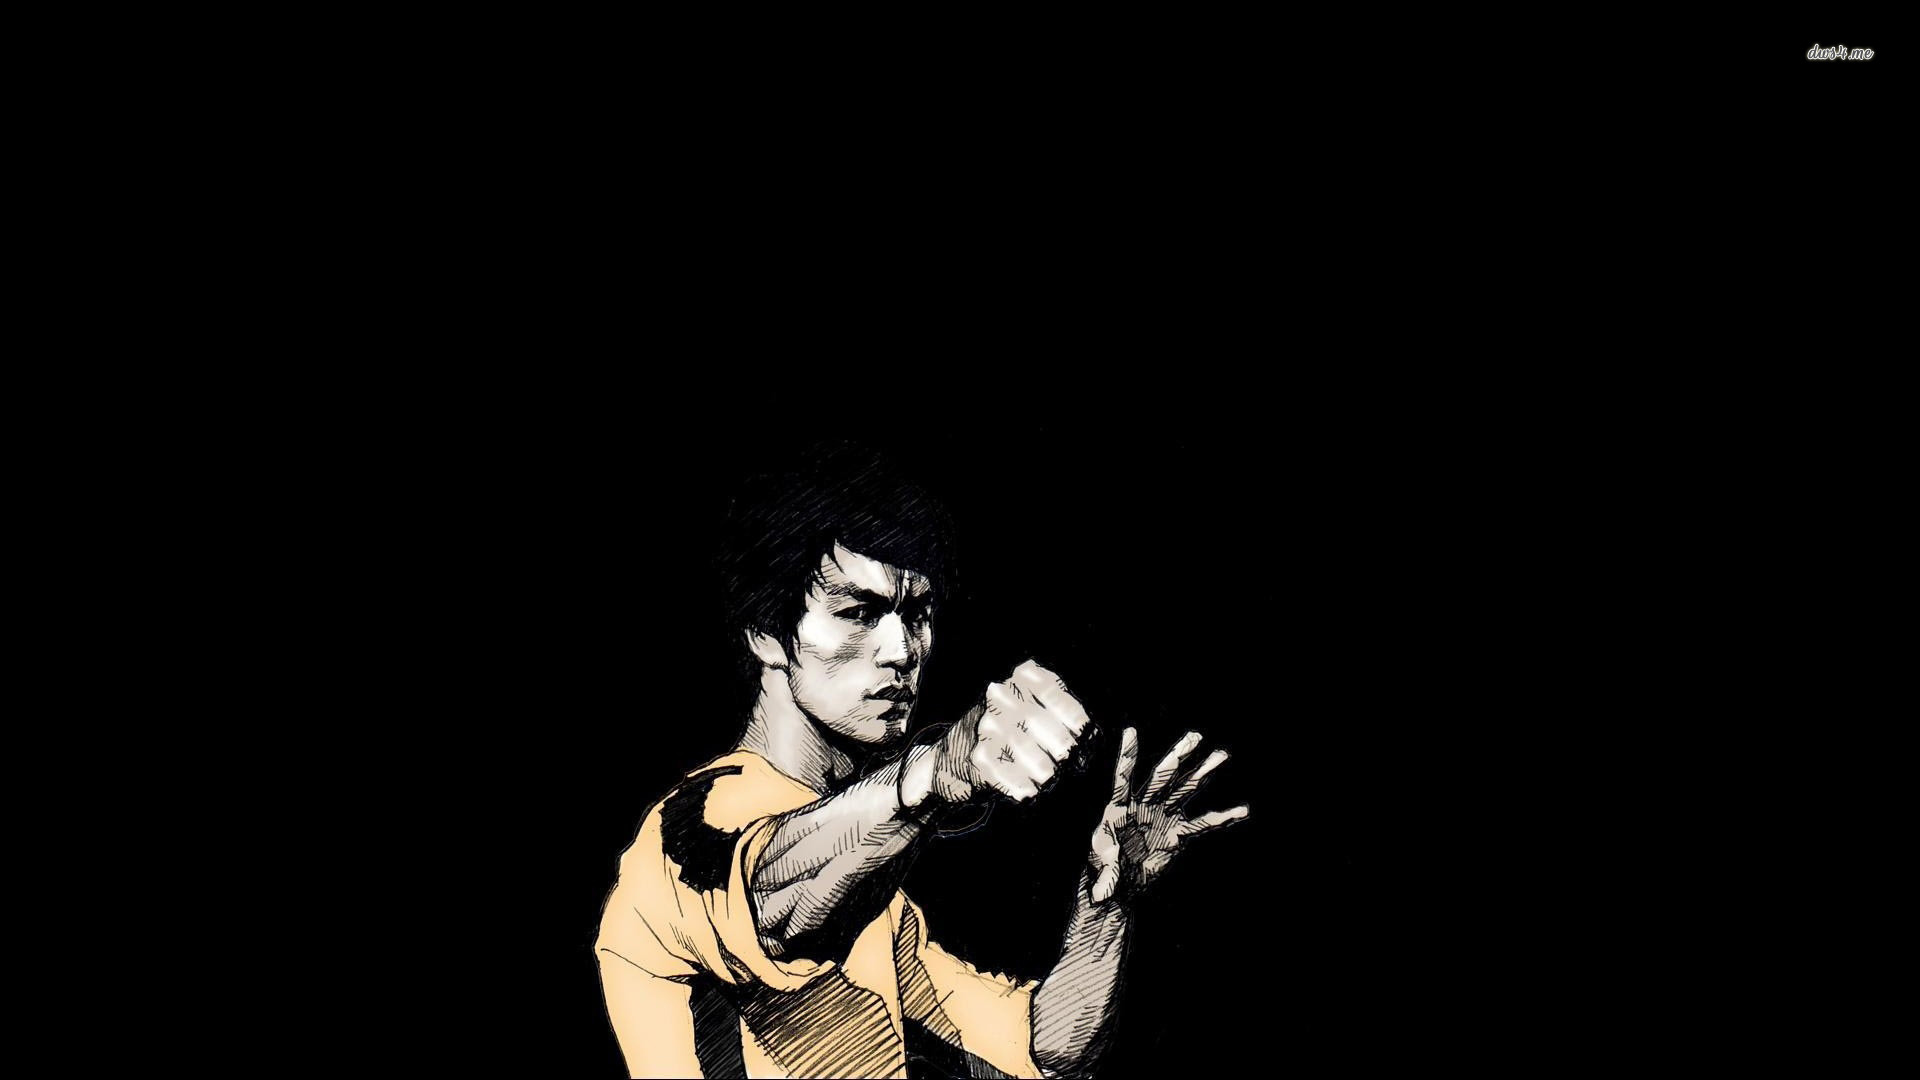 Bruce Lee Wallpaper 4